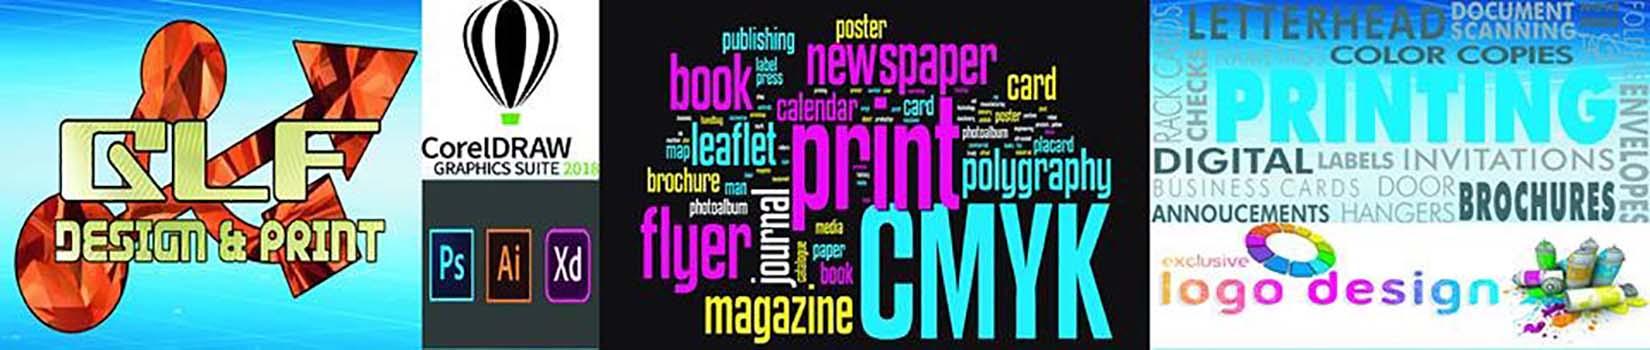 GLF Design & Print